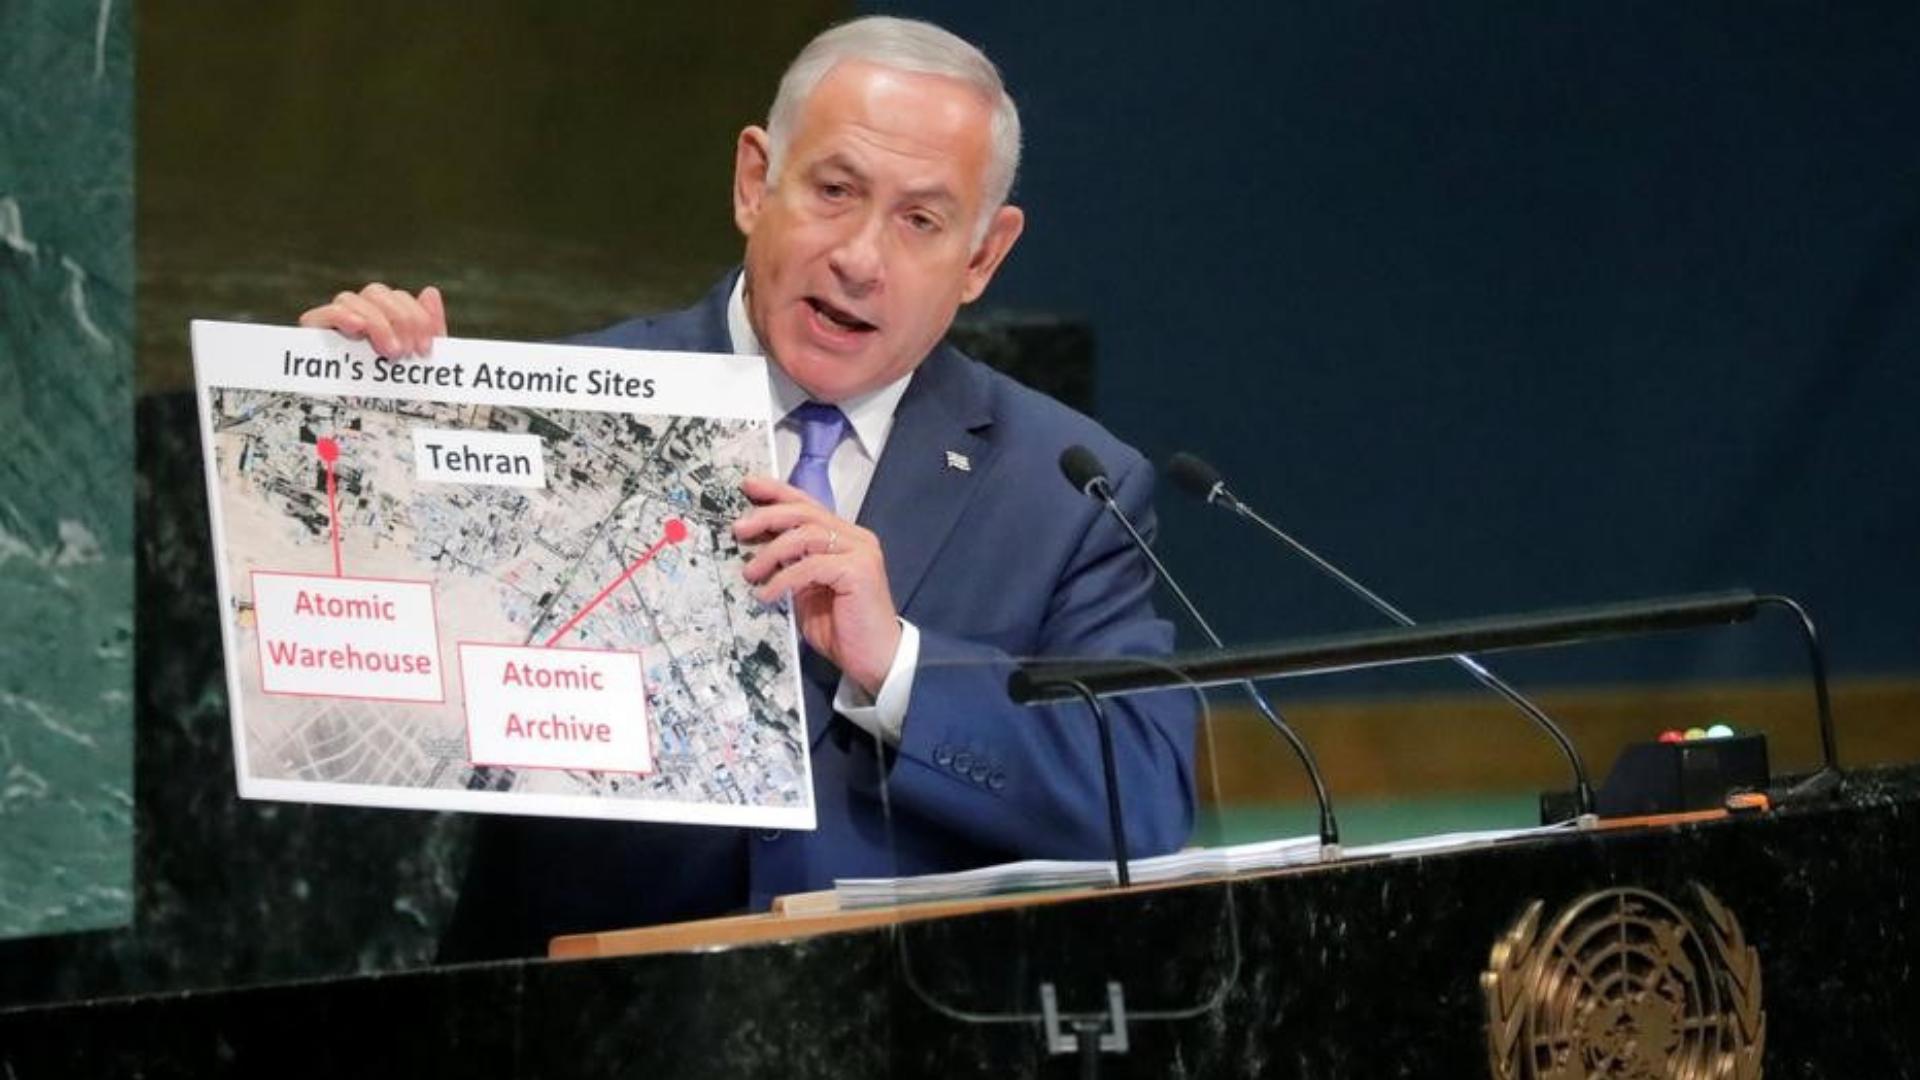 Trump and Netanyahu risk sparking nuclear arms race